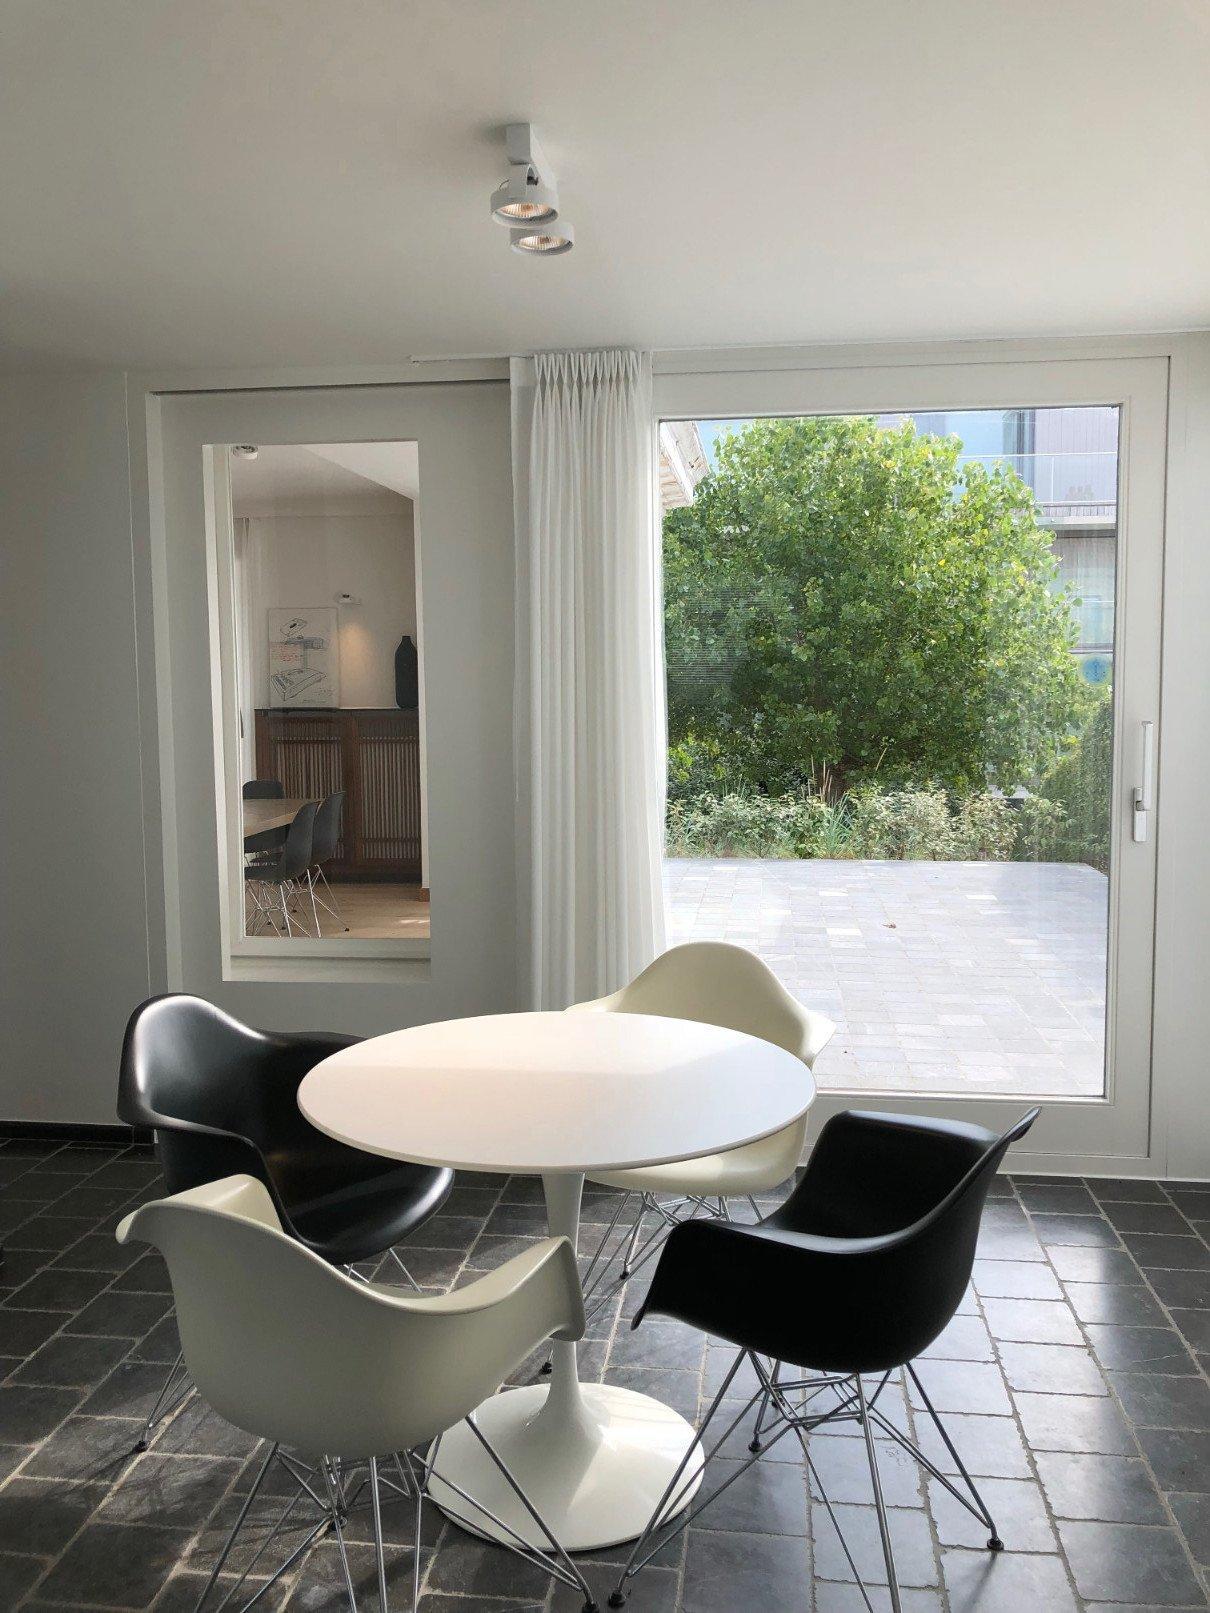 Rietveldprojects-Villa Were Di - Te Koop : Te Huur (per week)34.jpg